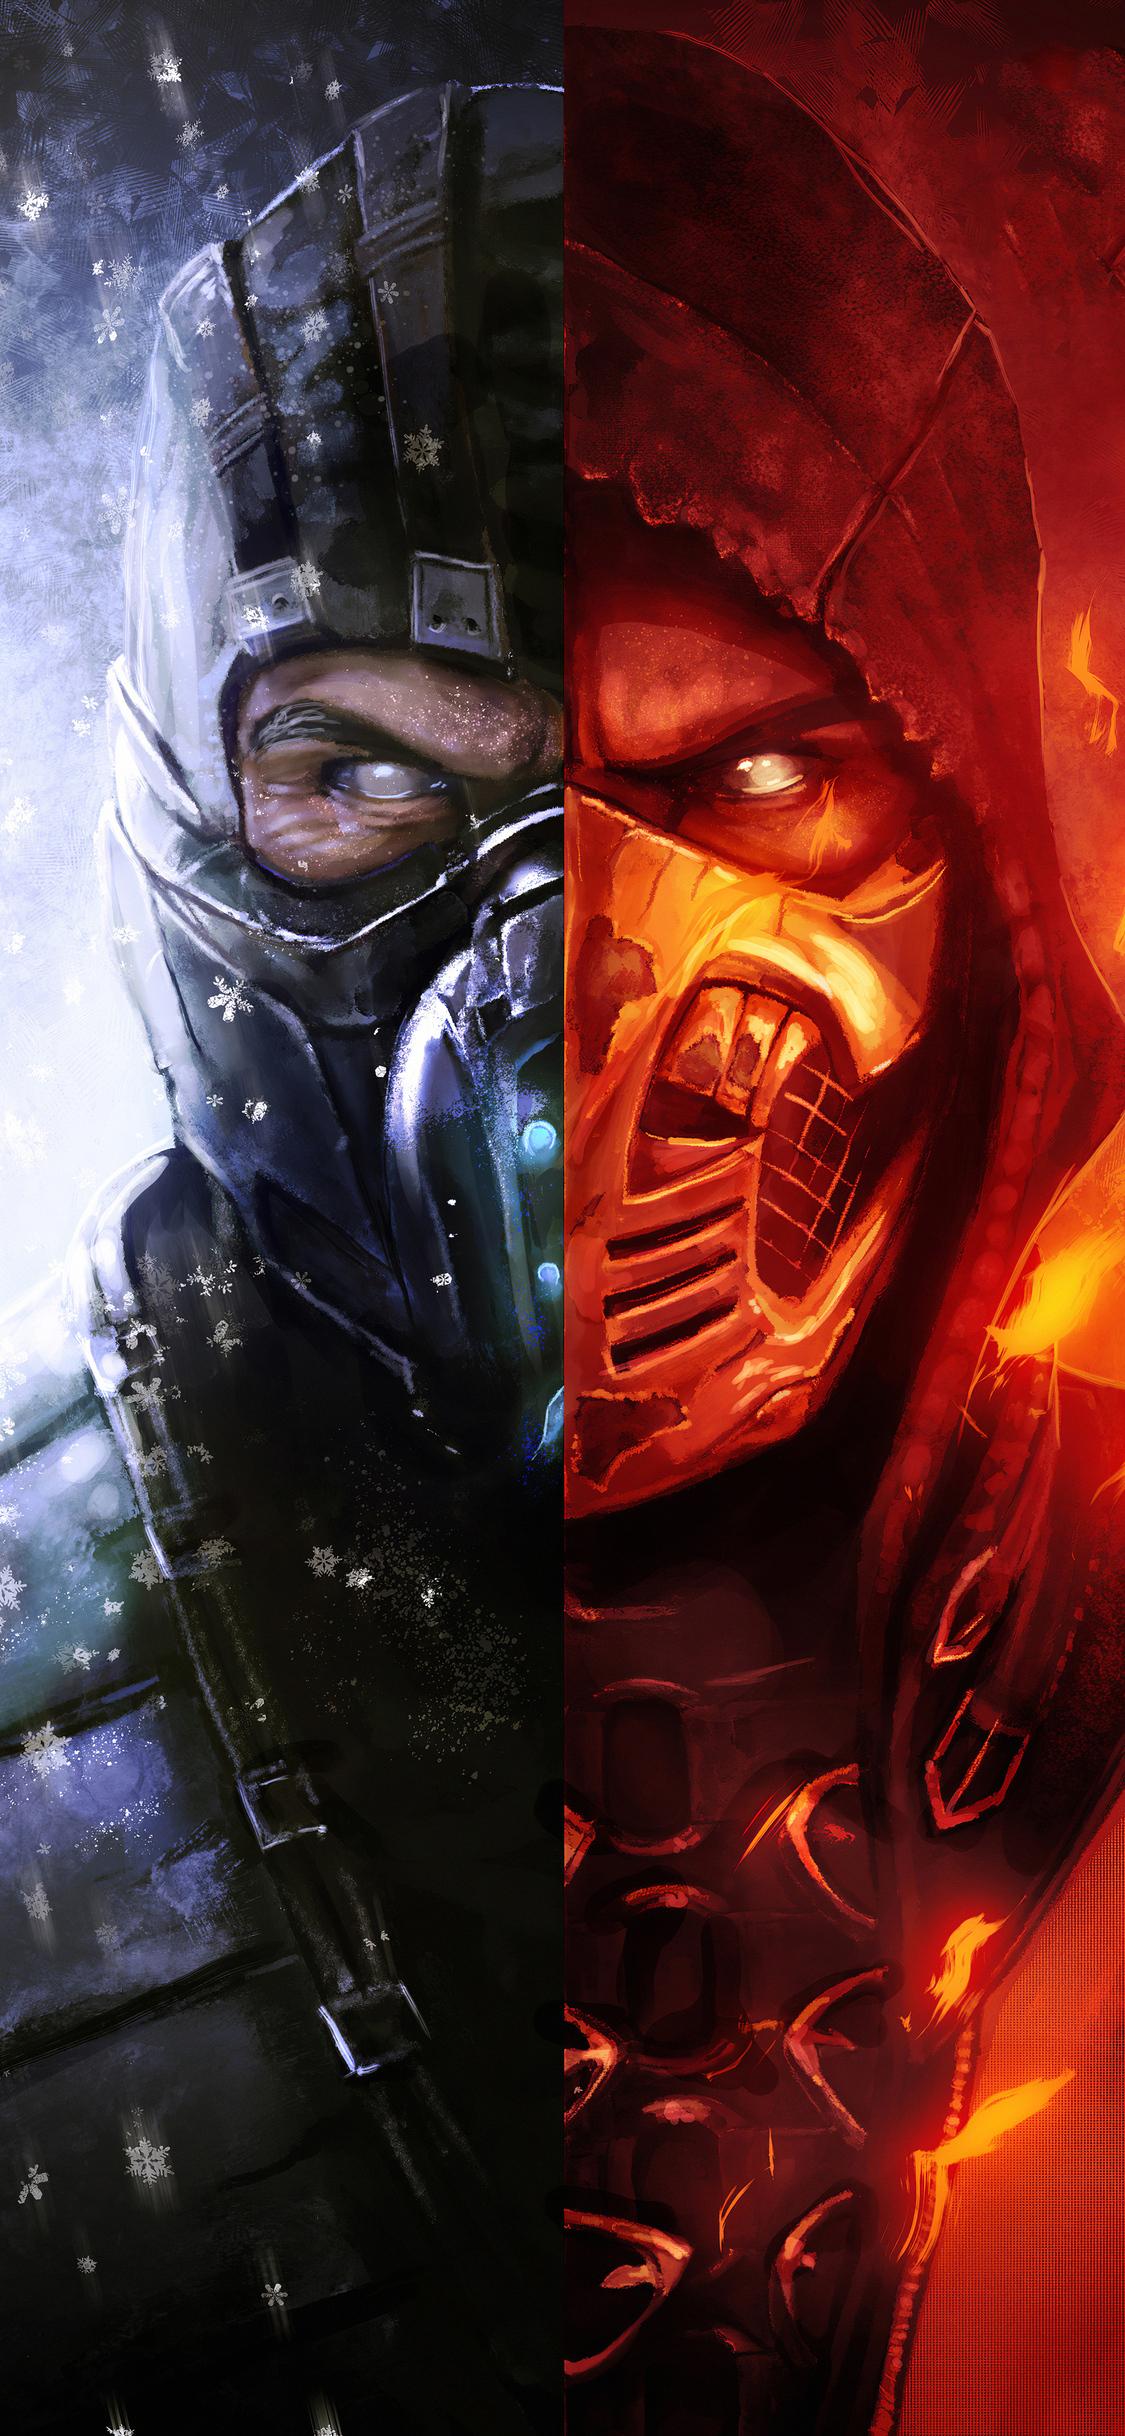 1125x2436 Scorpion Mortal Kombat X Art4k Iphone Xs Iphone 10